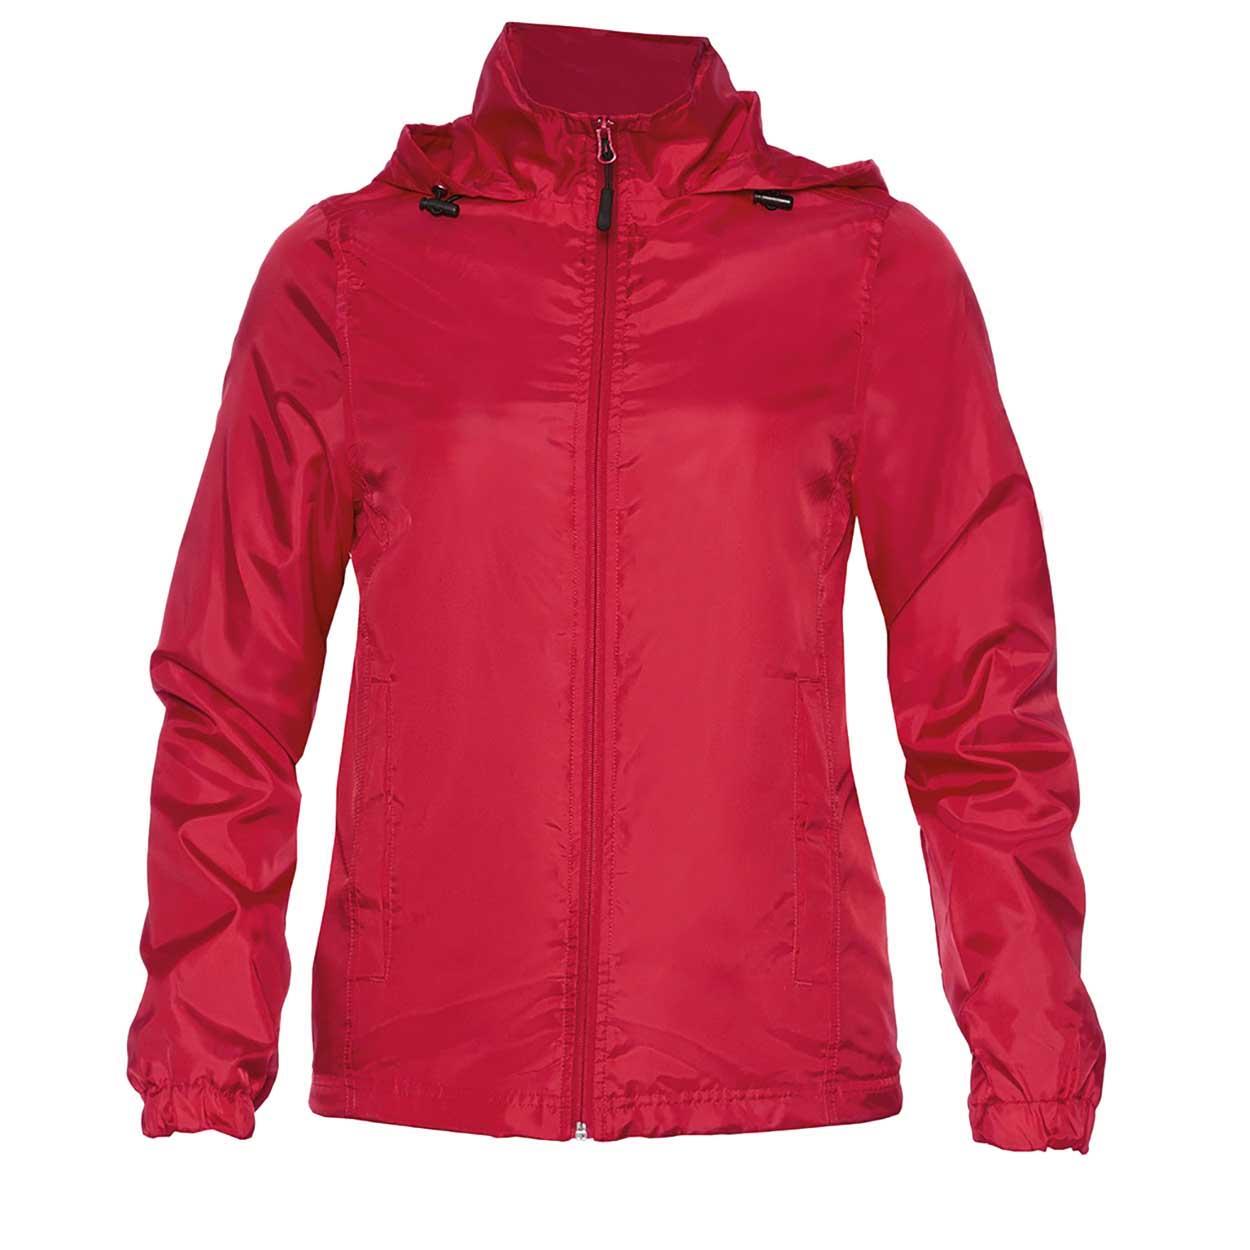 Gildan Womens/Ladies Hammer Windwear Jacket (M) (Red)